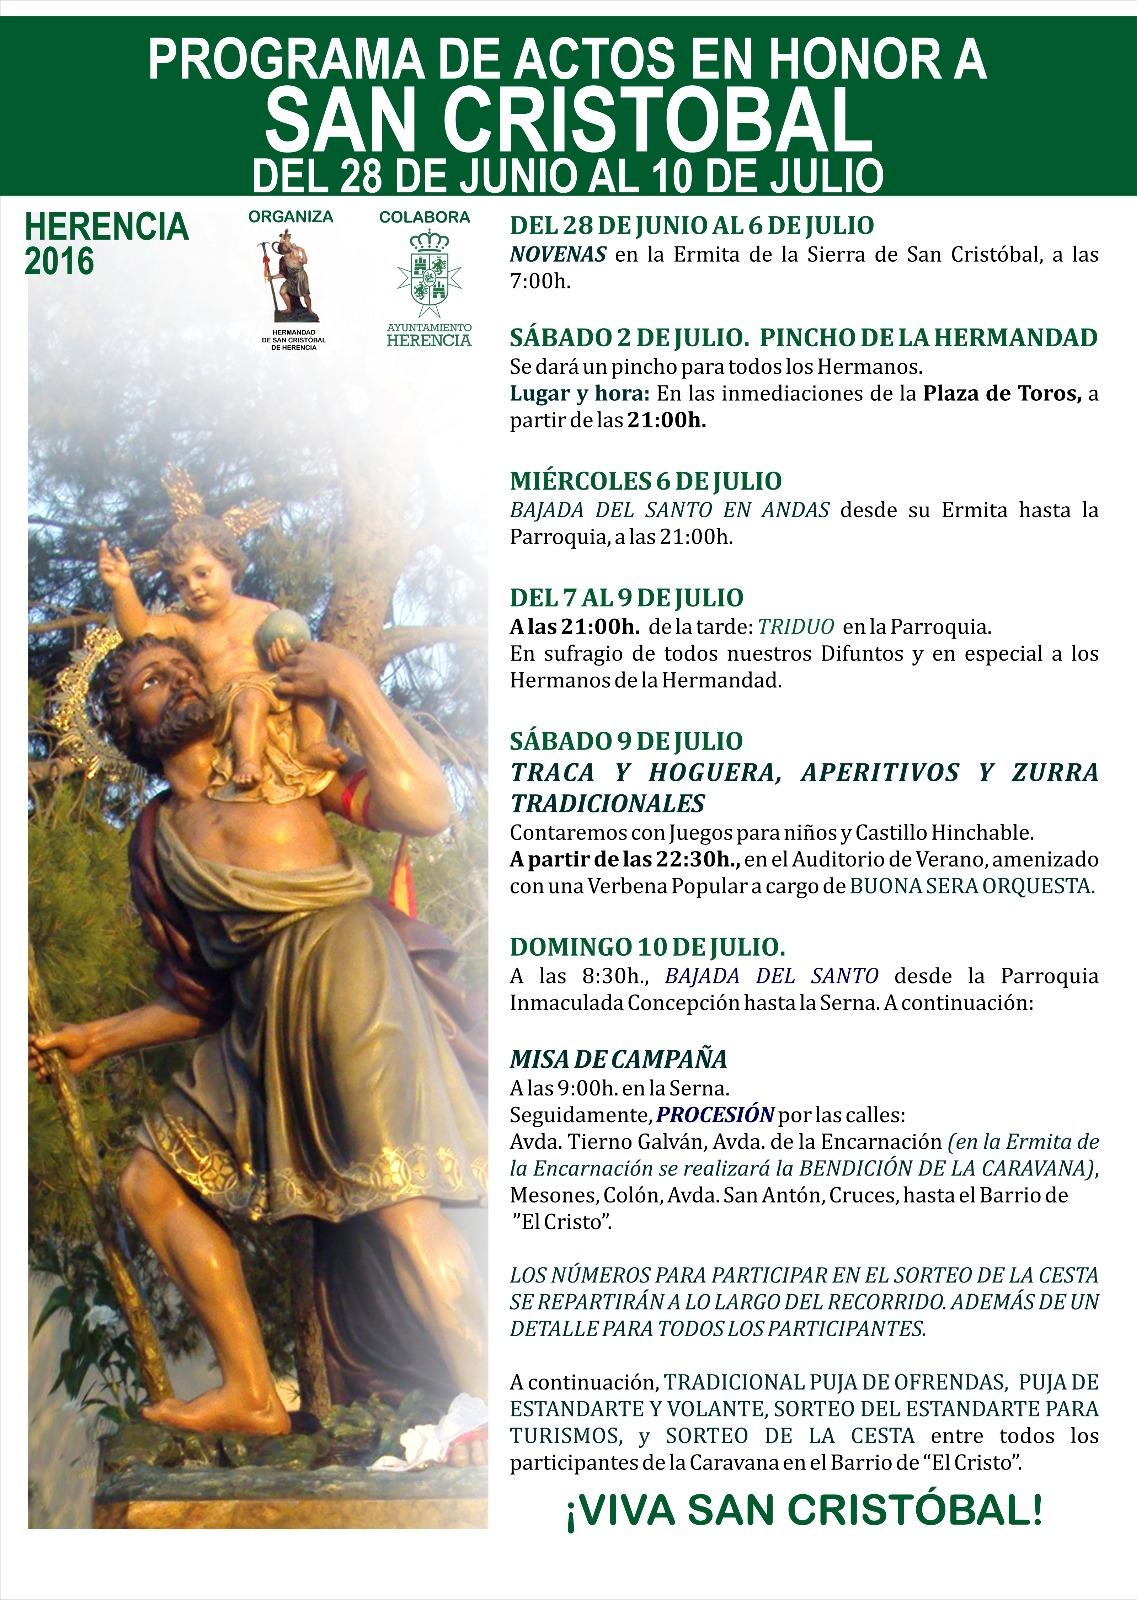 Programa de actos 2016